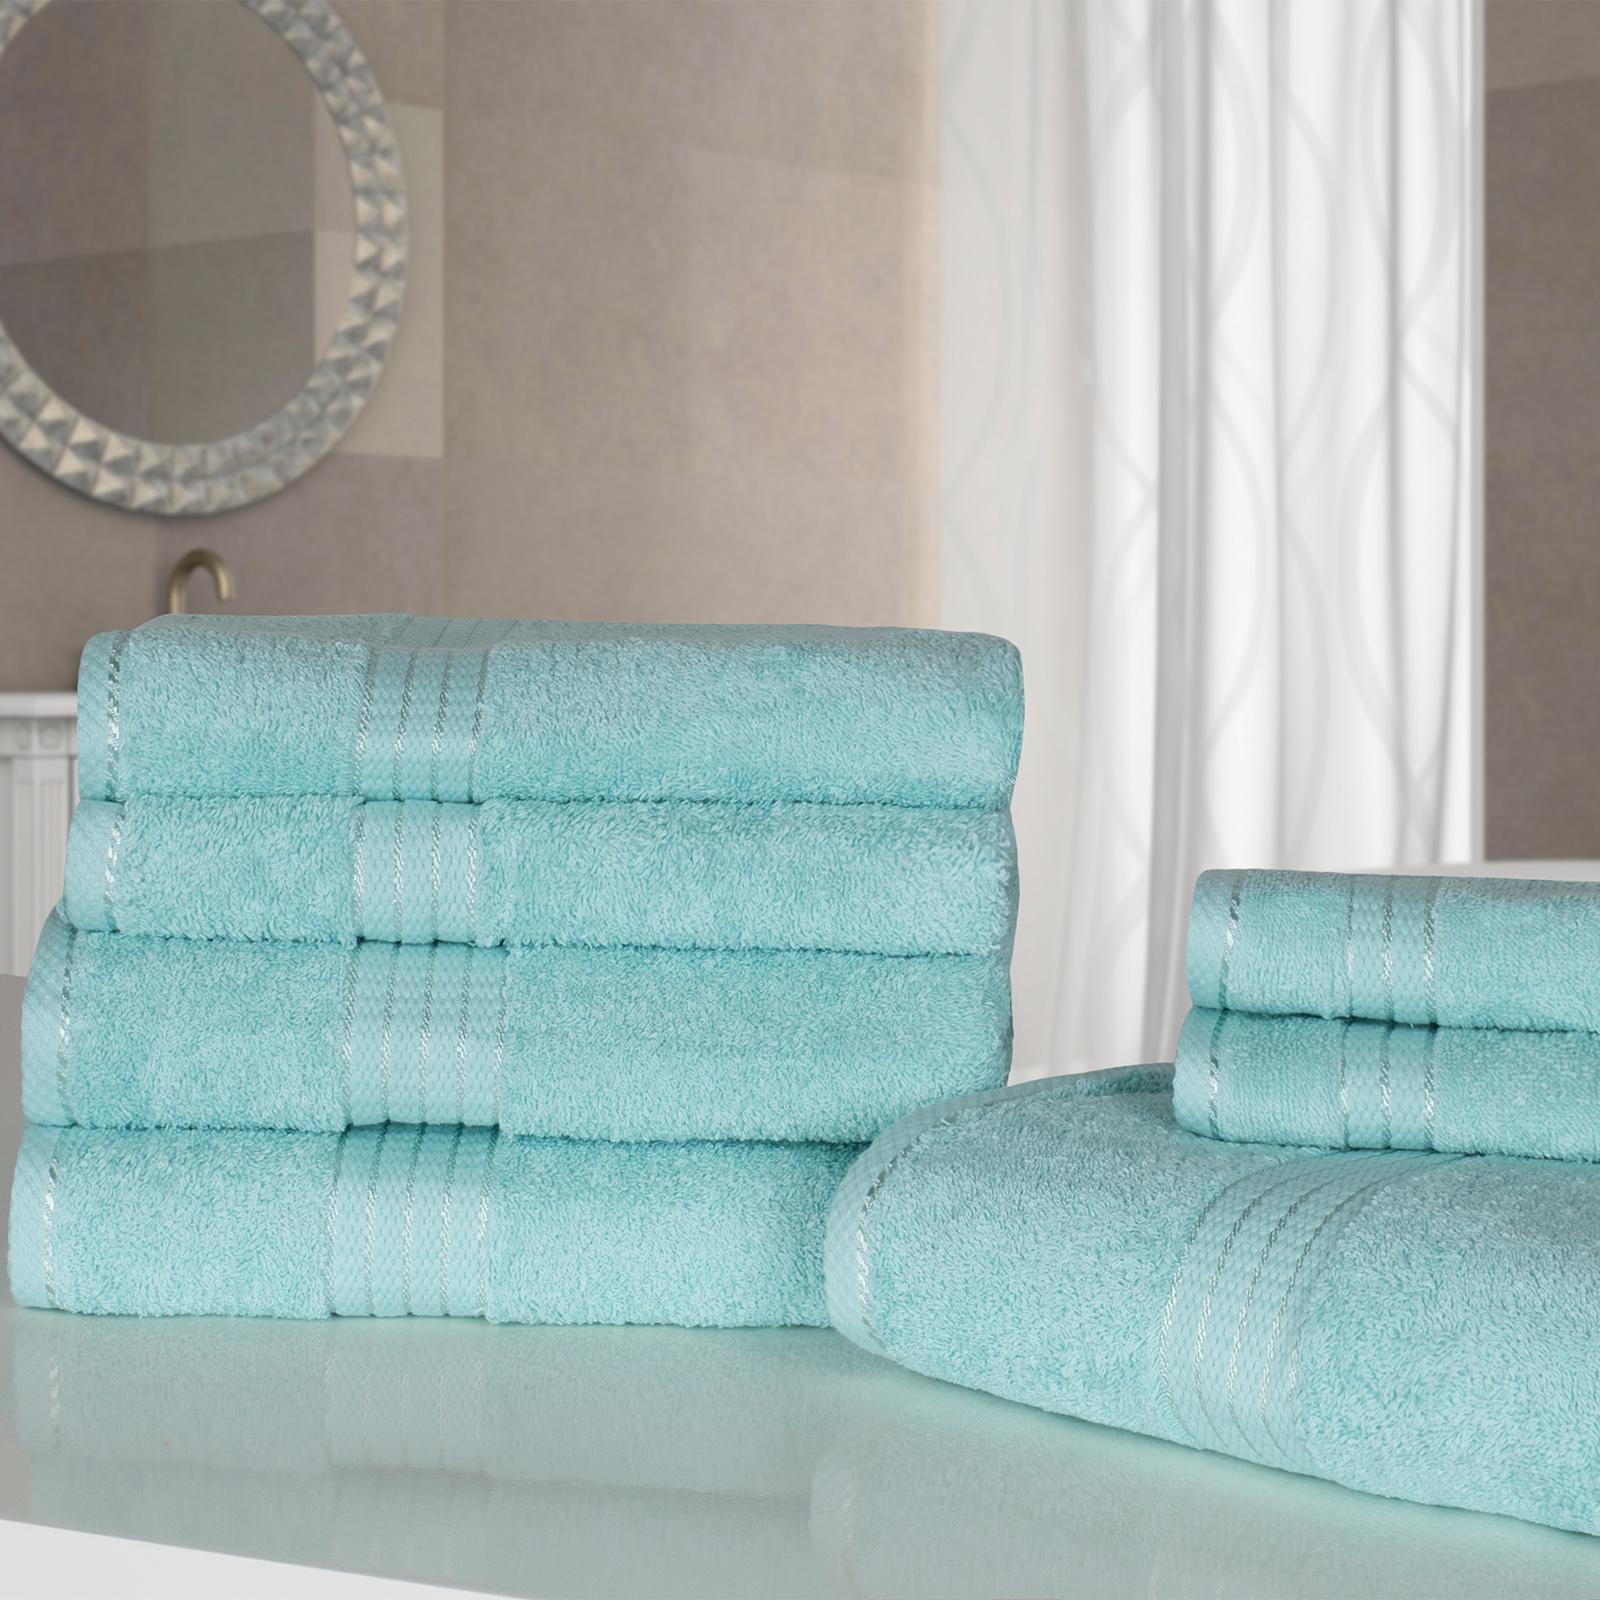 Bathroom Towels Luxury: Luxury Soft 7 Piece Hand Bath Towel Bale Gift Set 100